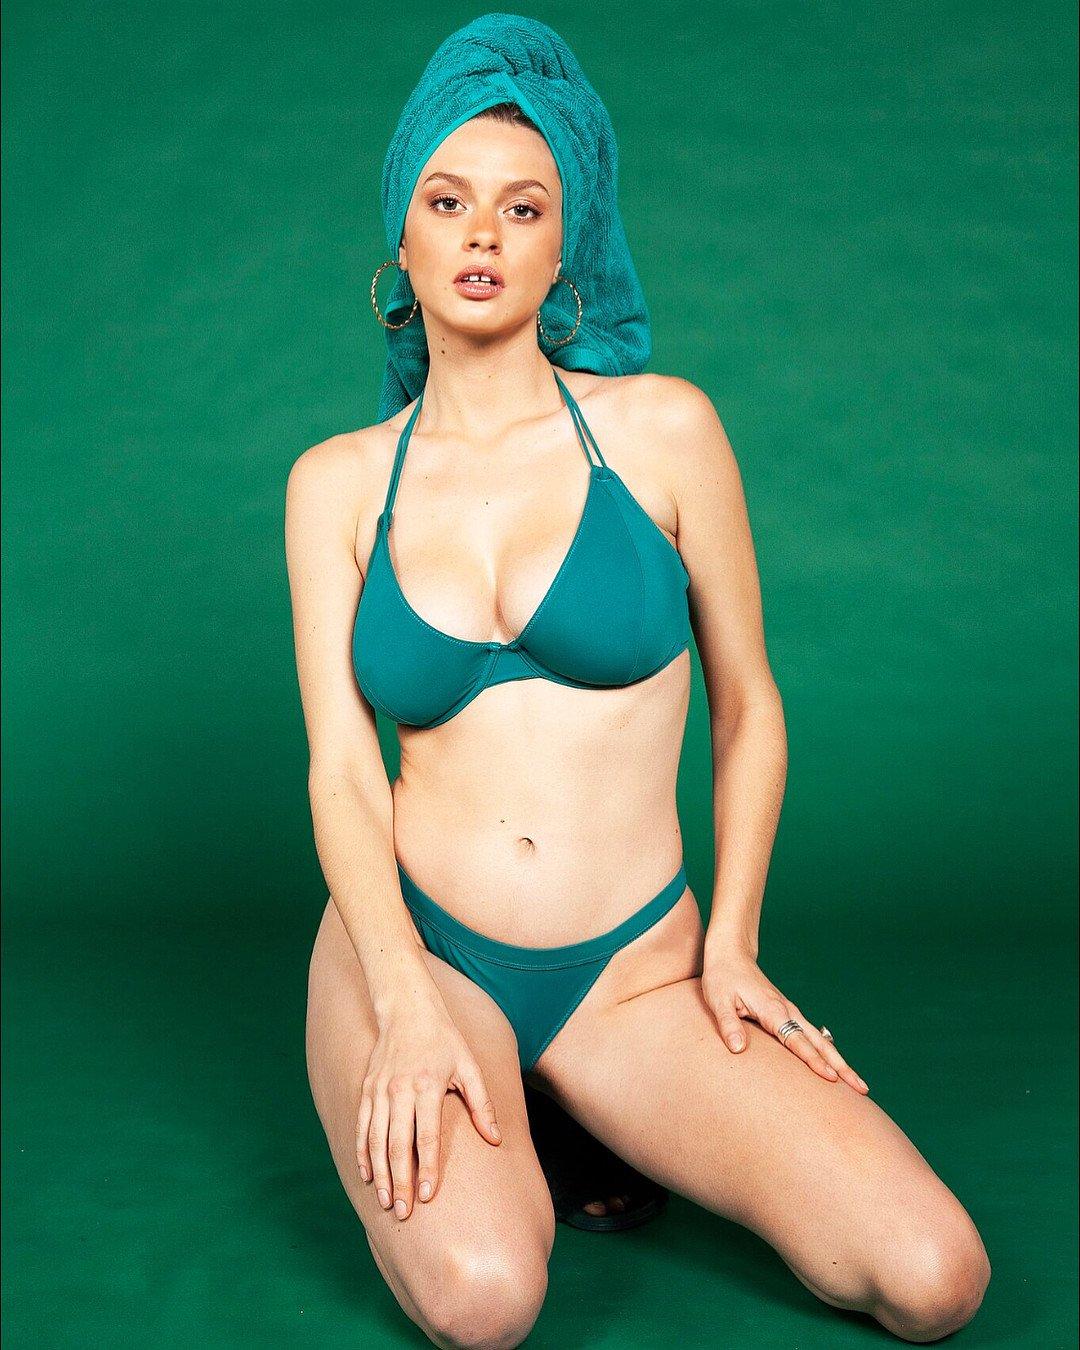 Twitter Elle Brittain nudes (87 photos), Tits, Hot, Selfie, cameltoe 2015